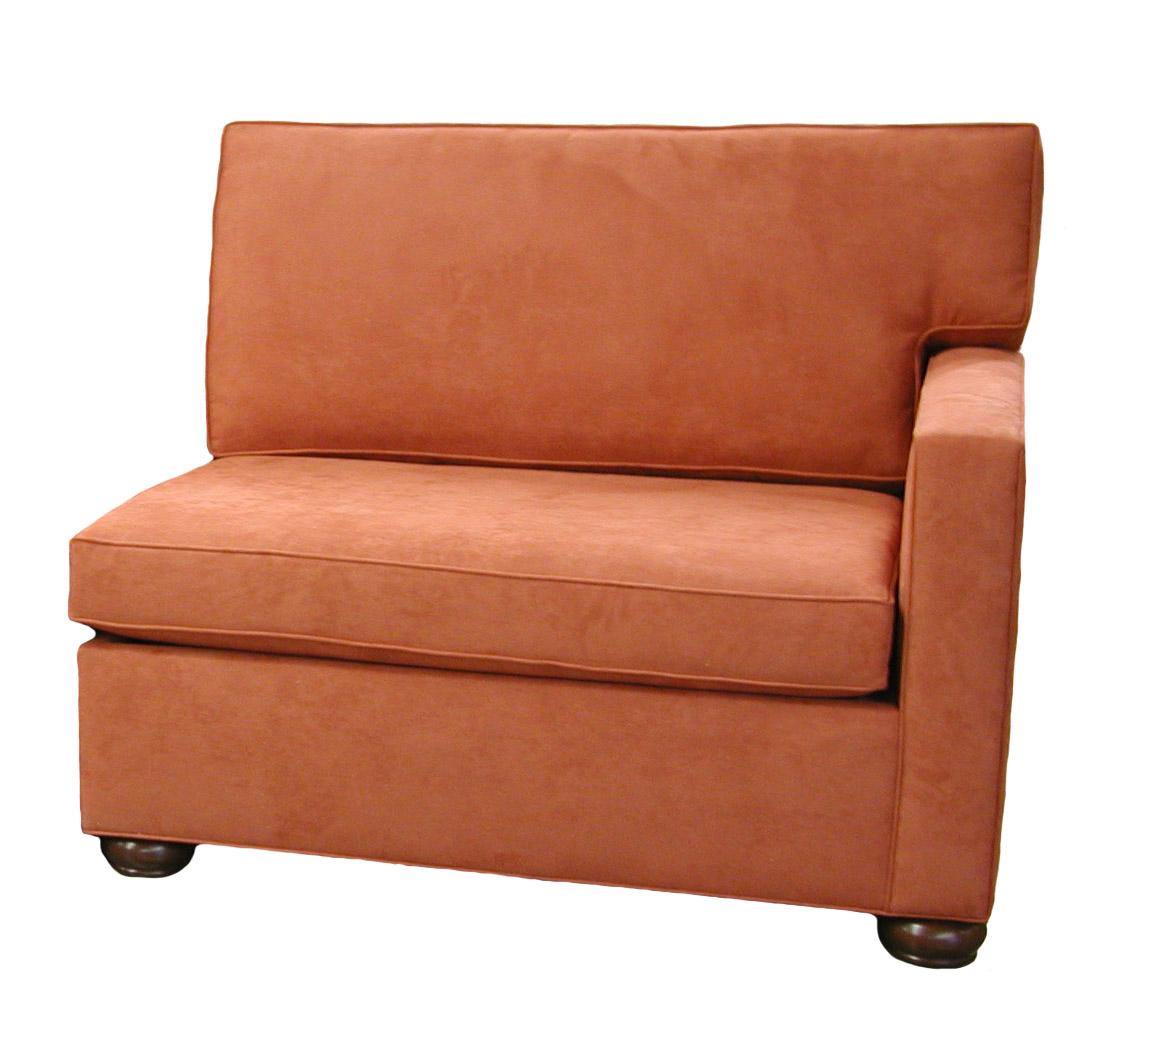 Crawford 1-Arm Single Sleeper Sofa Right Facing